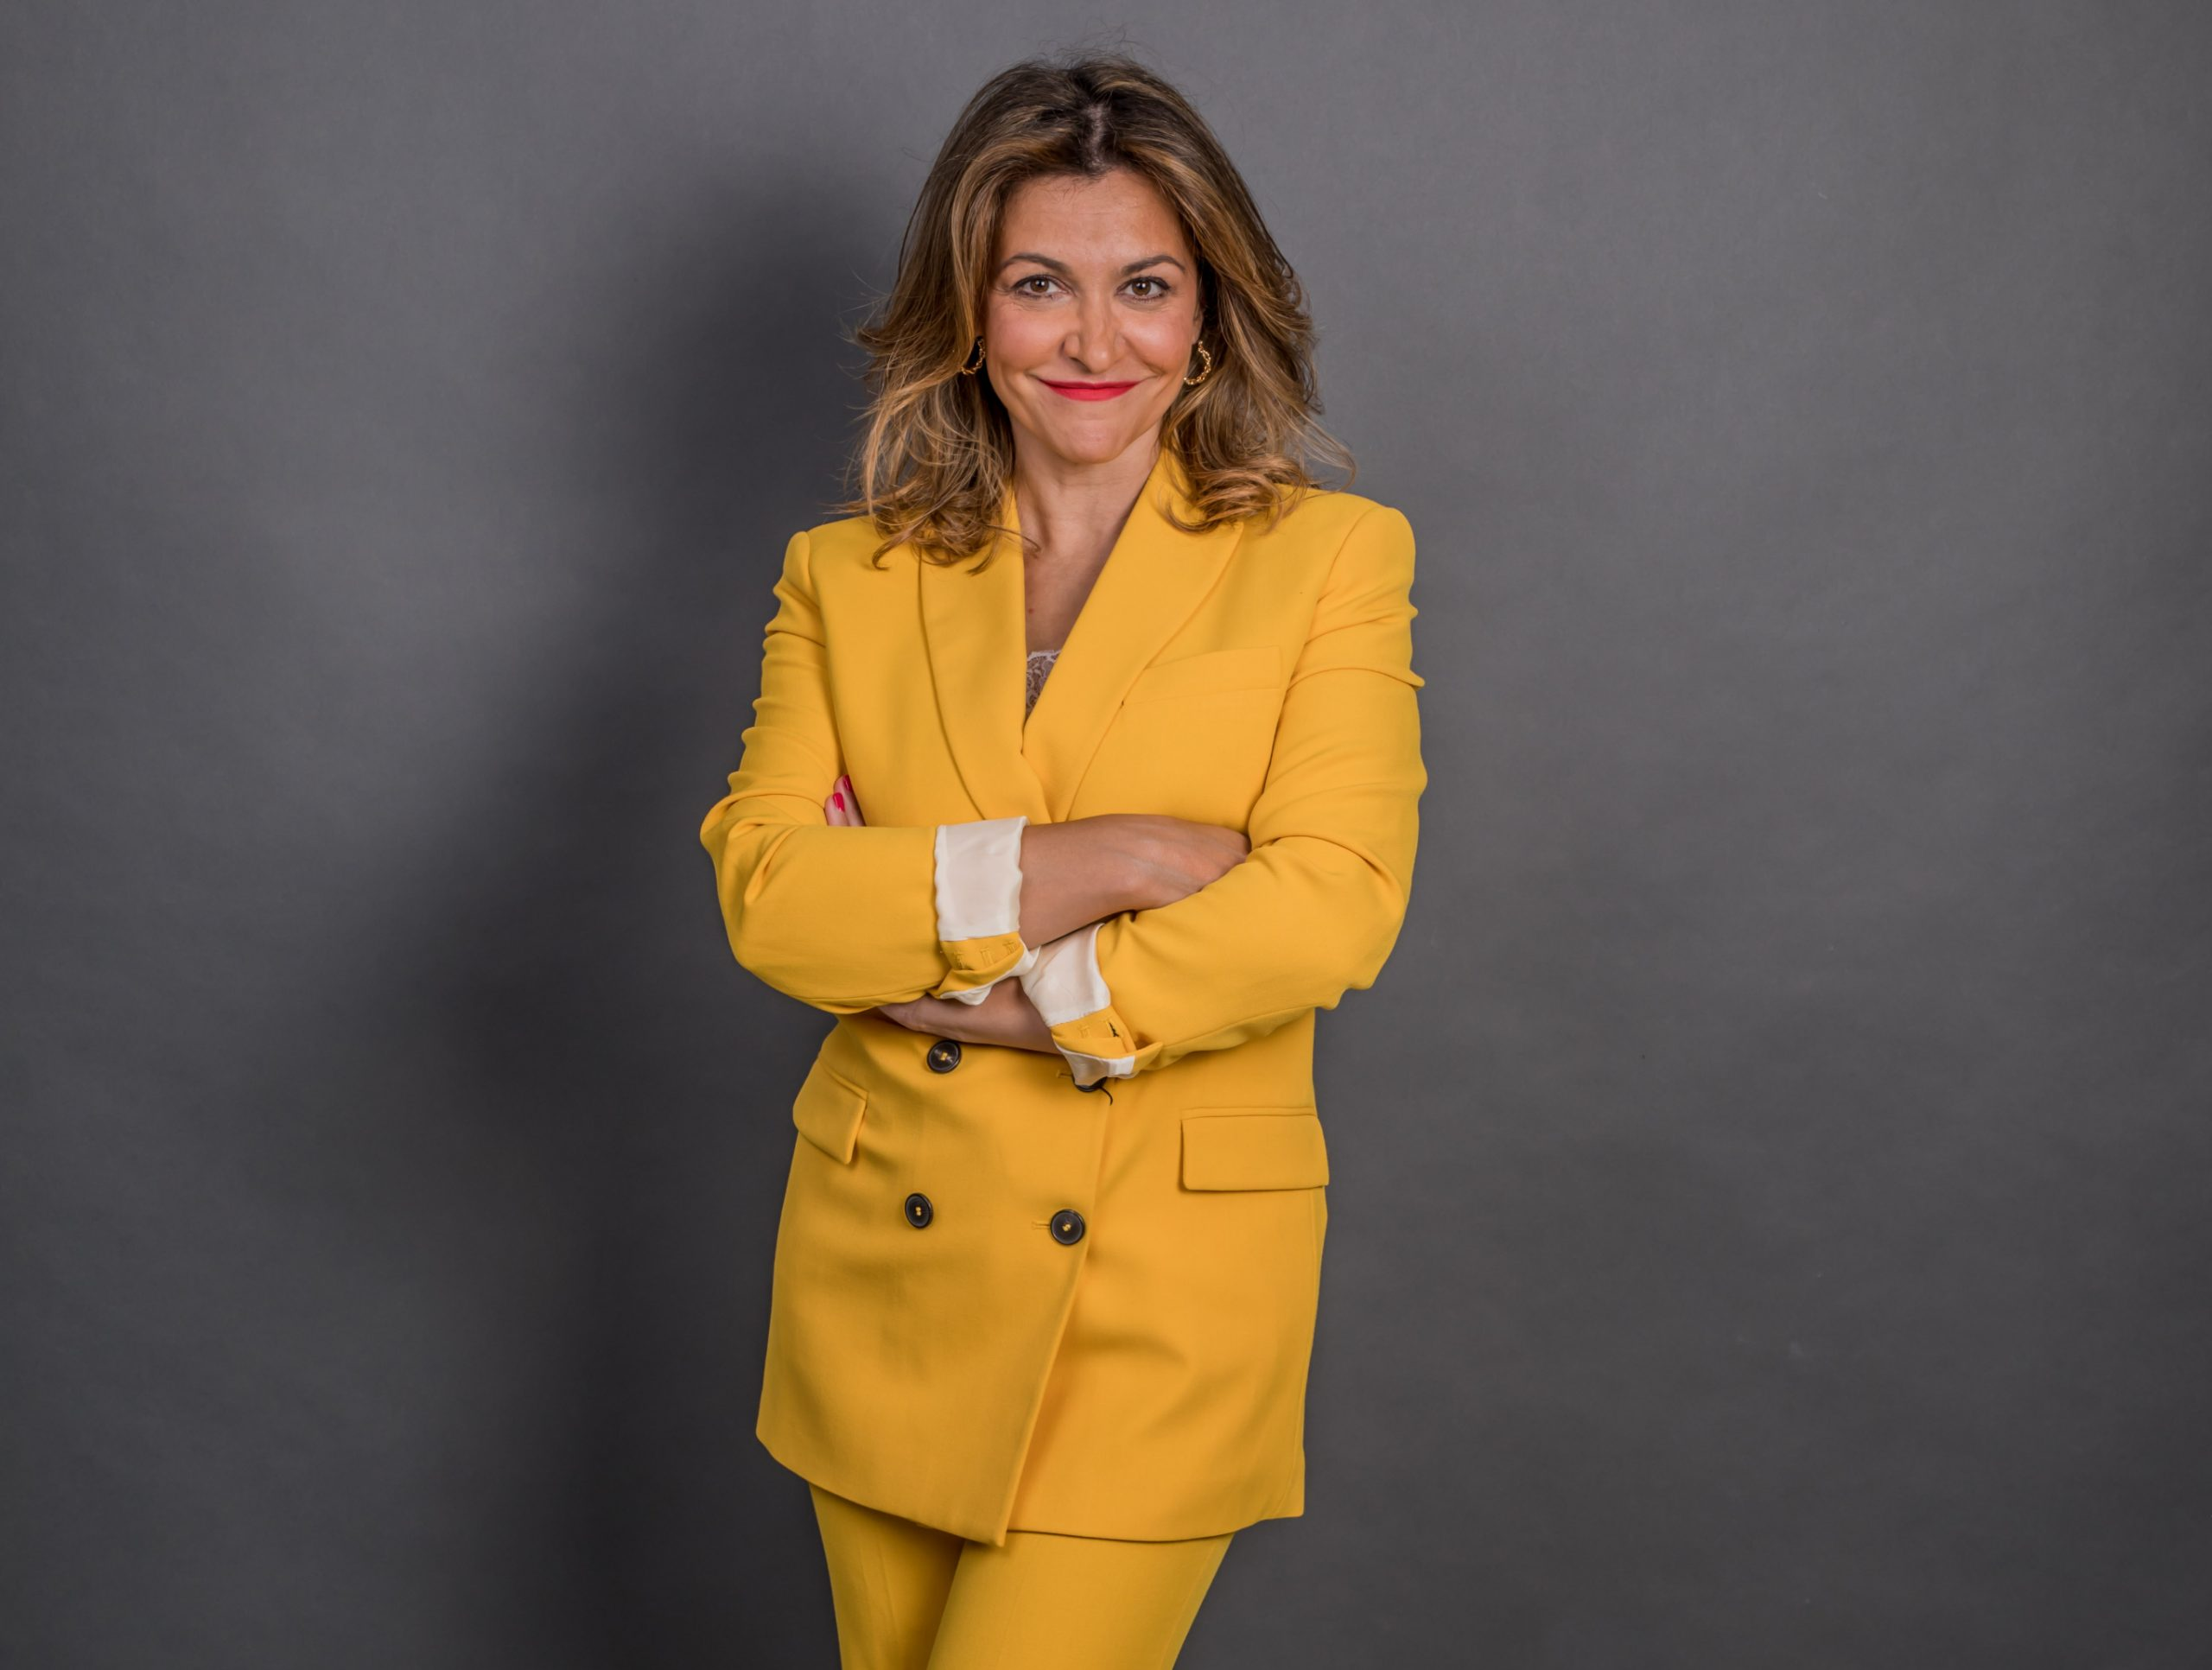 Paloma Palencia